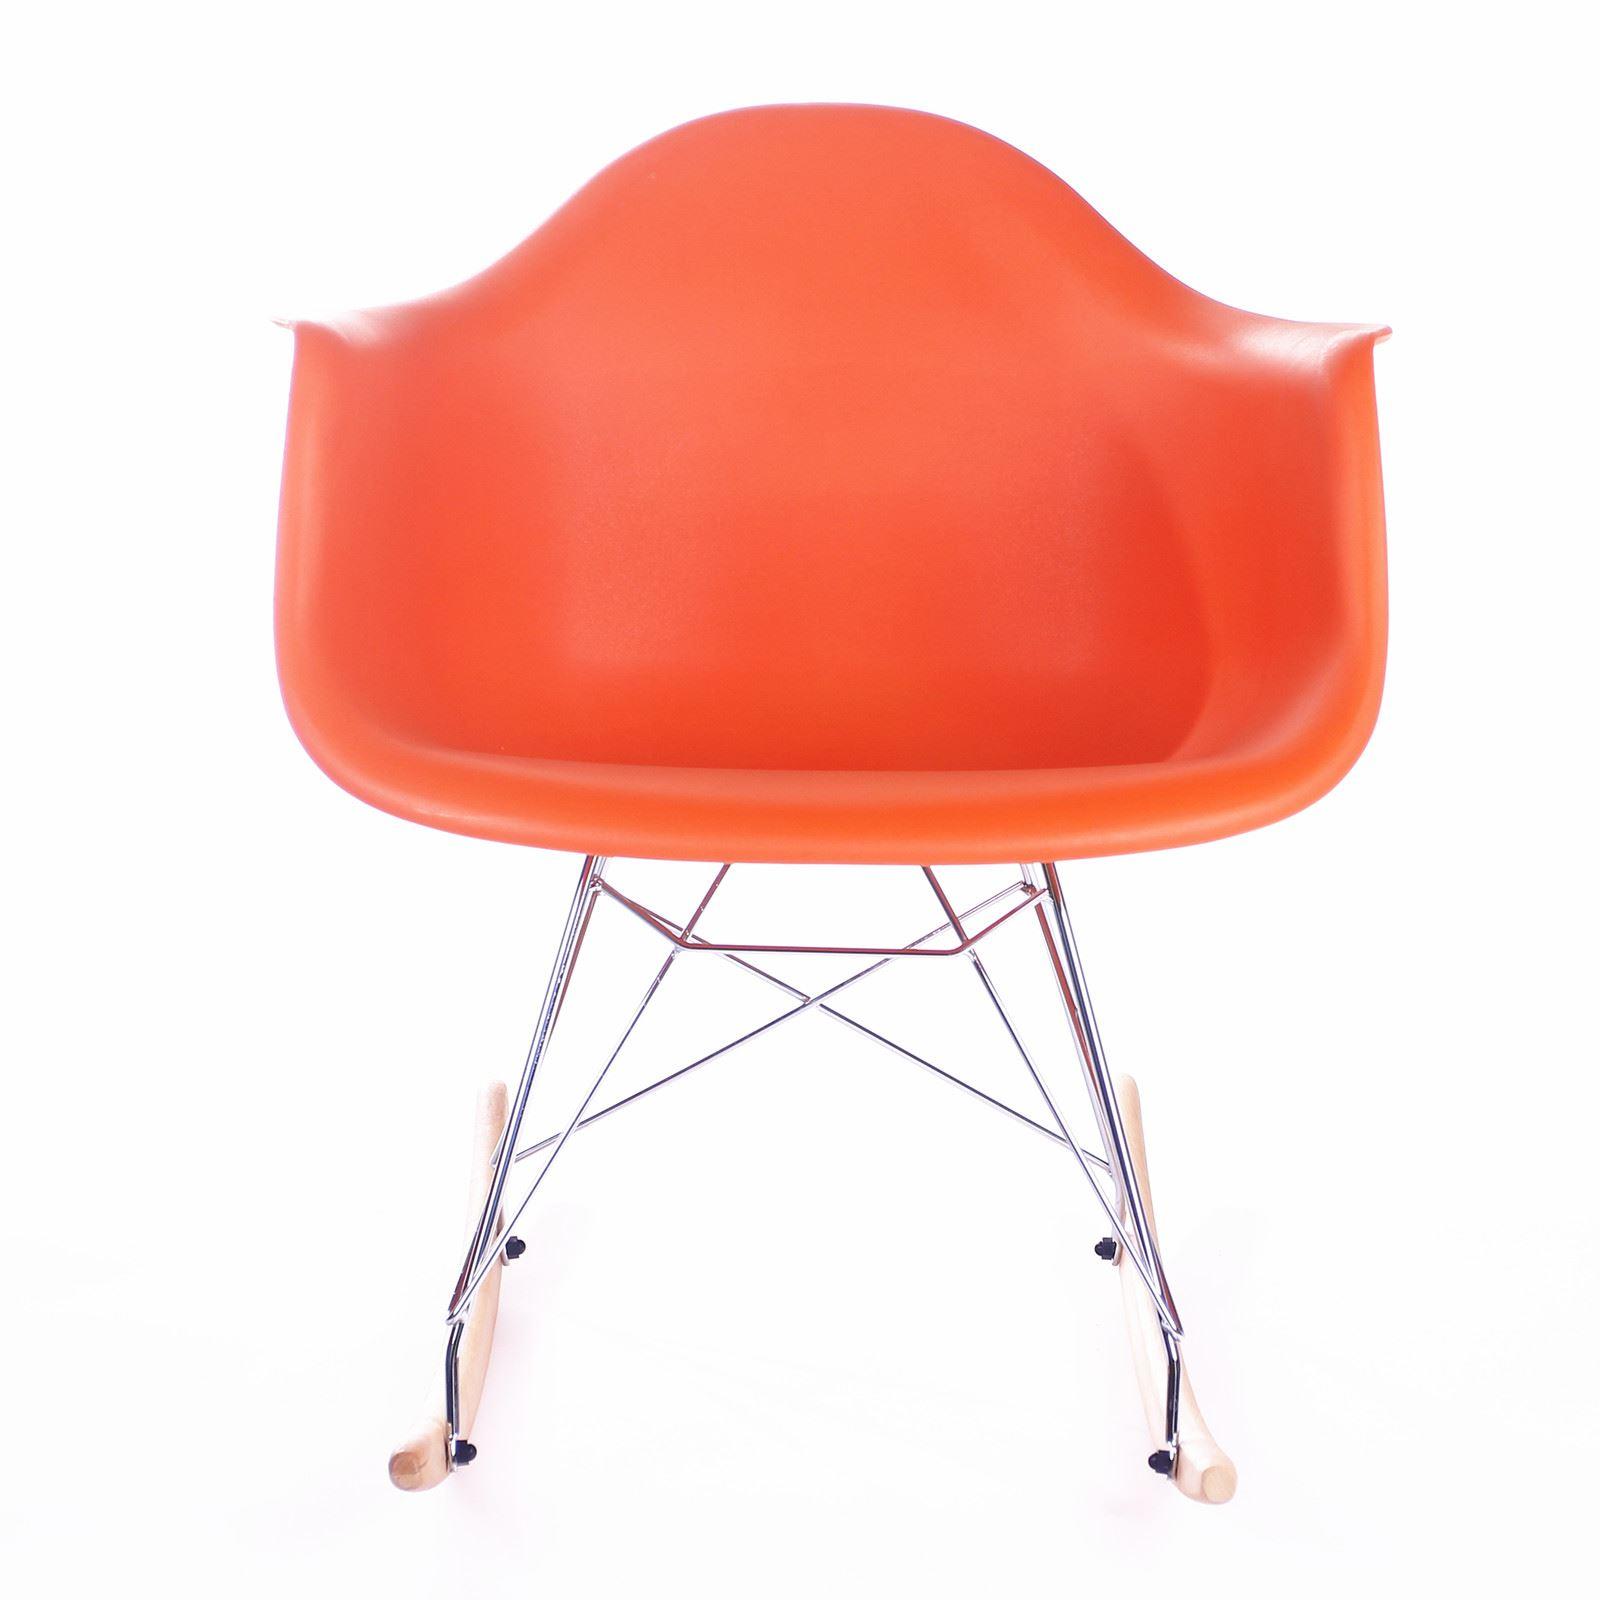 baby room rocking chair wood lawn eames rar rocker armchair retro lounge